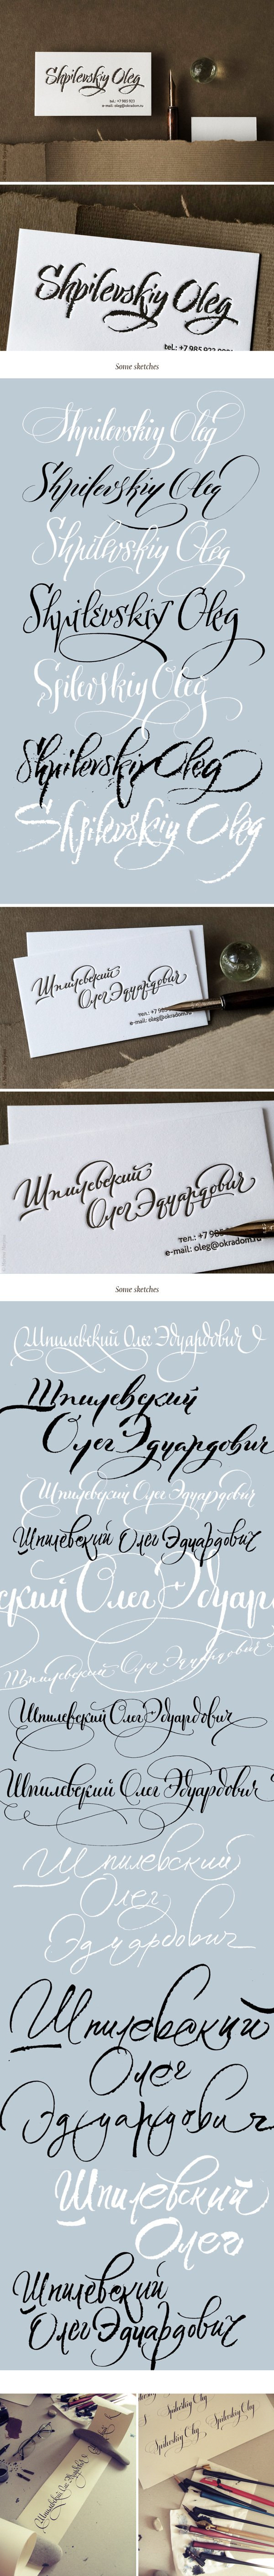 44. Calligraphy